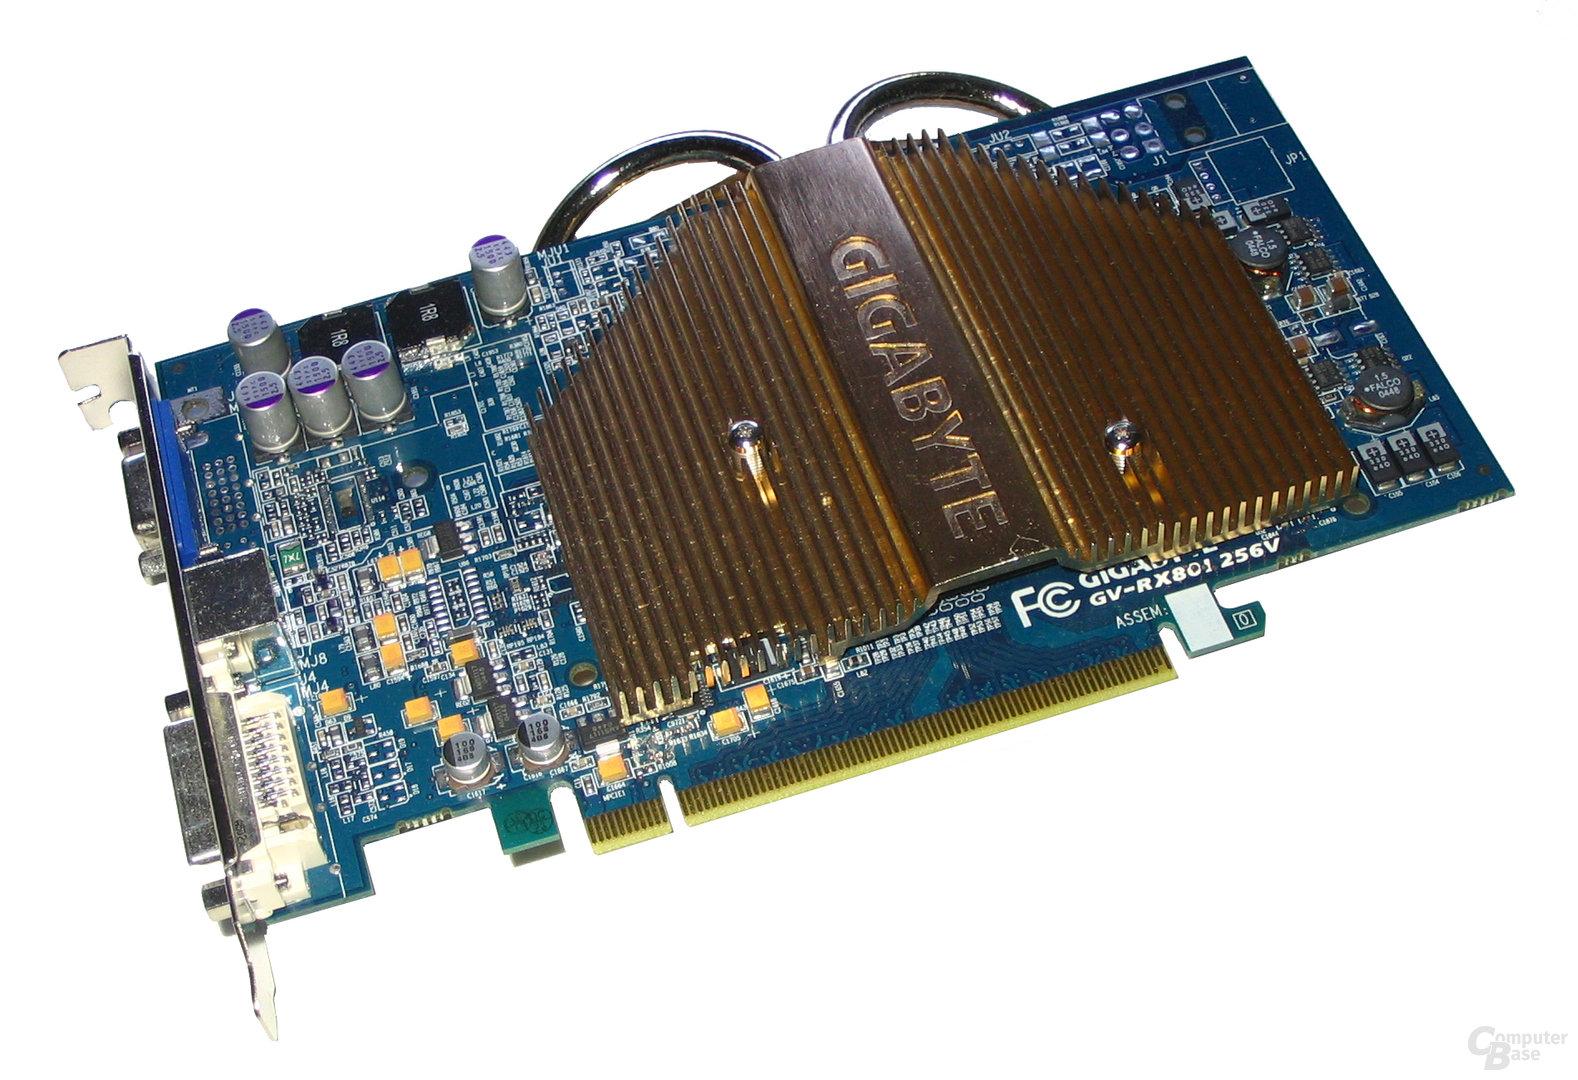 Gigabyte Radeon X800 XL